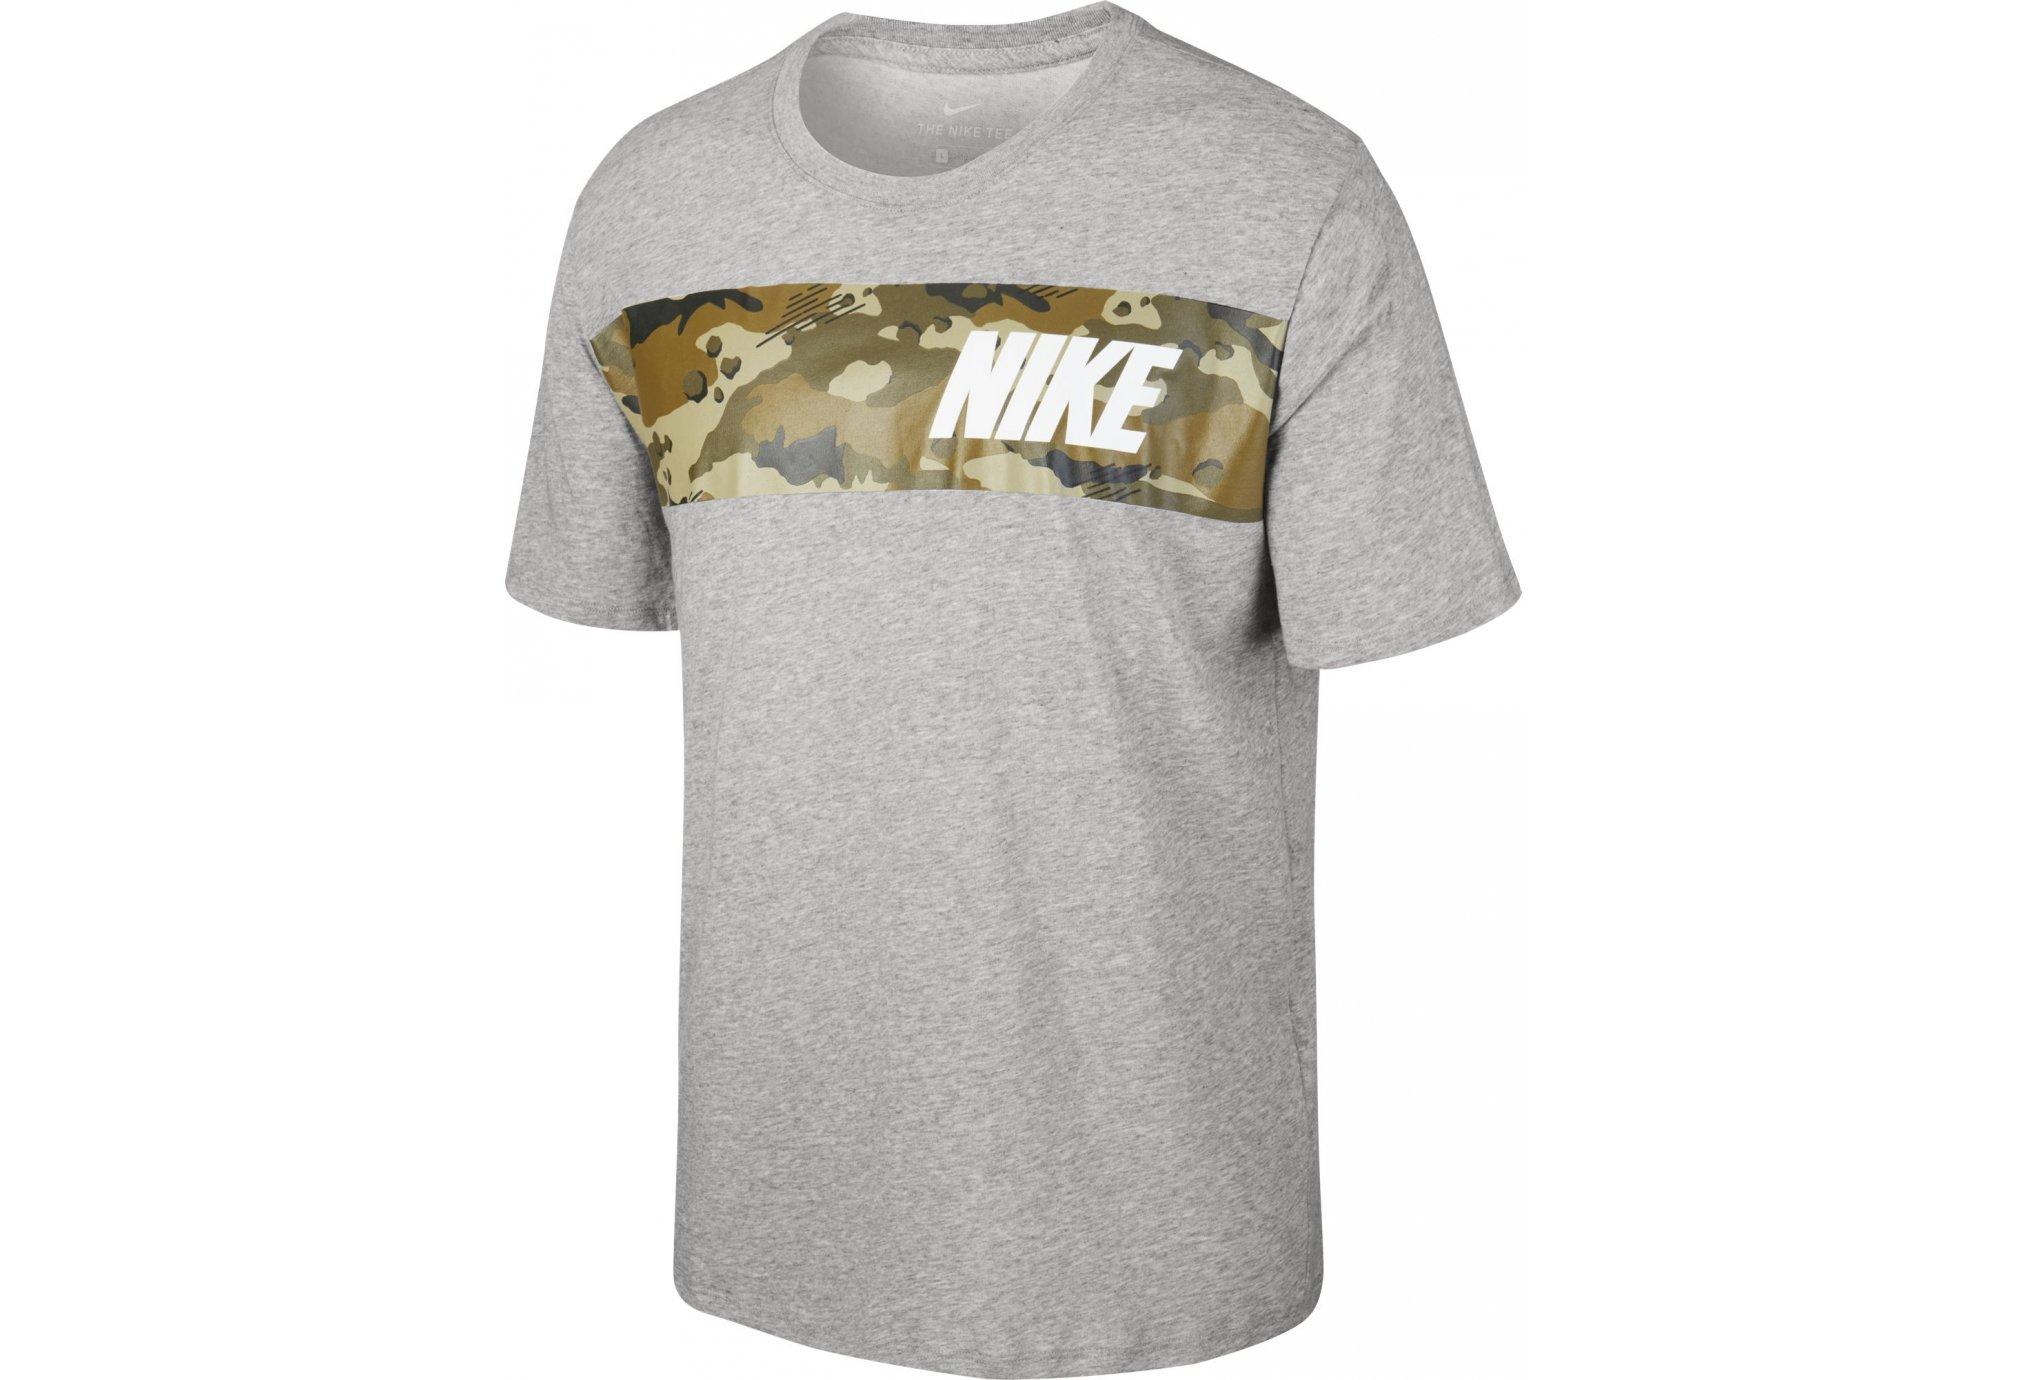 Nike Dry Dfc Block Camo M vêtement running homme